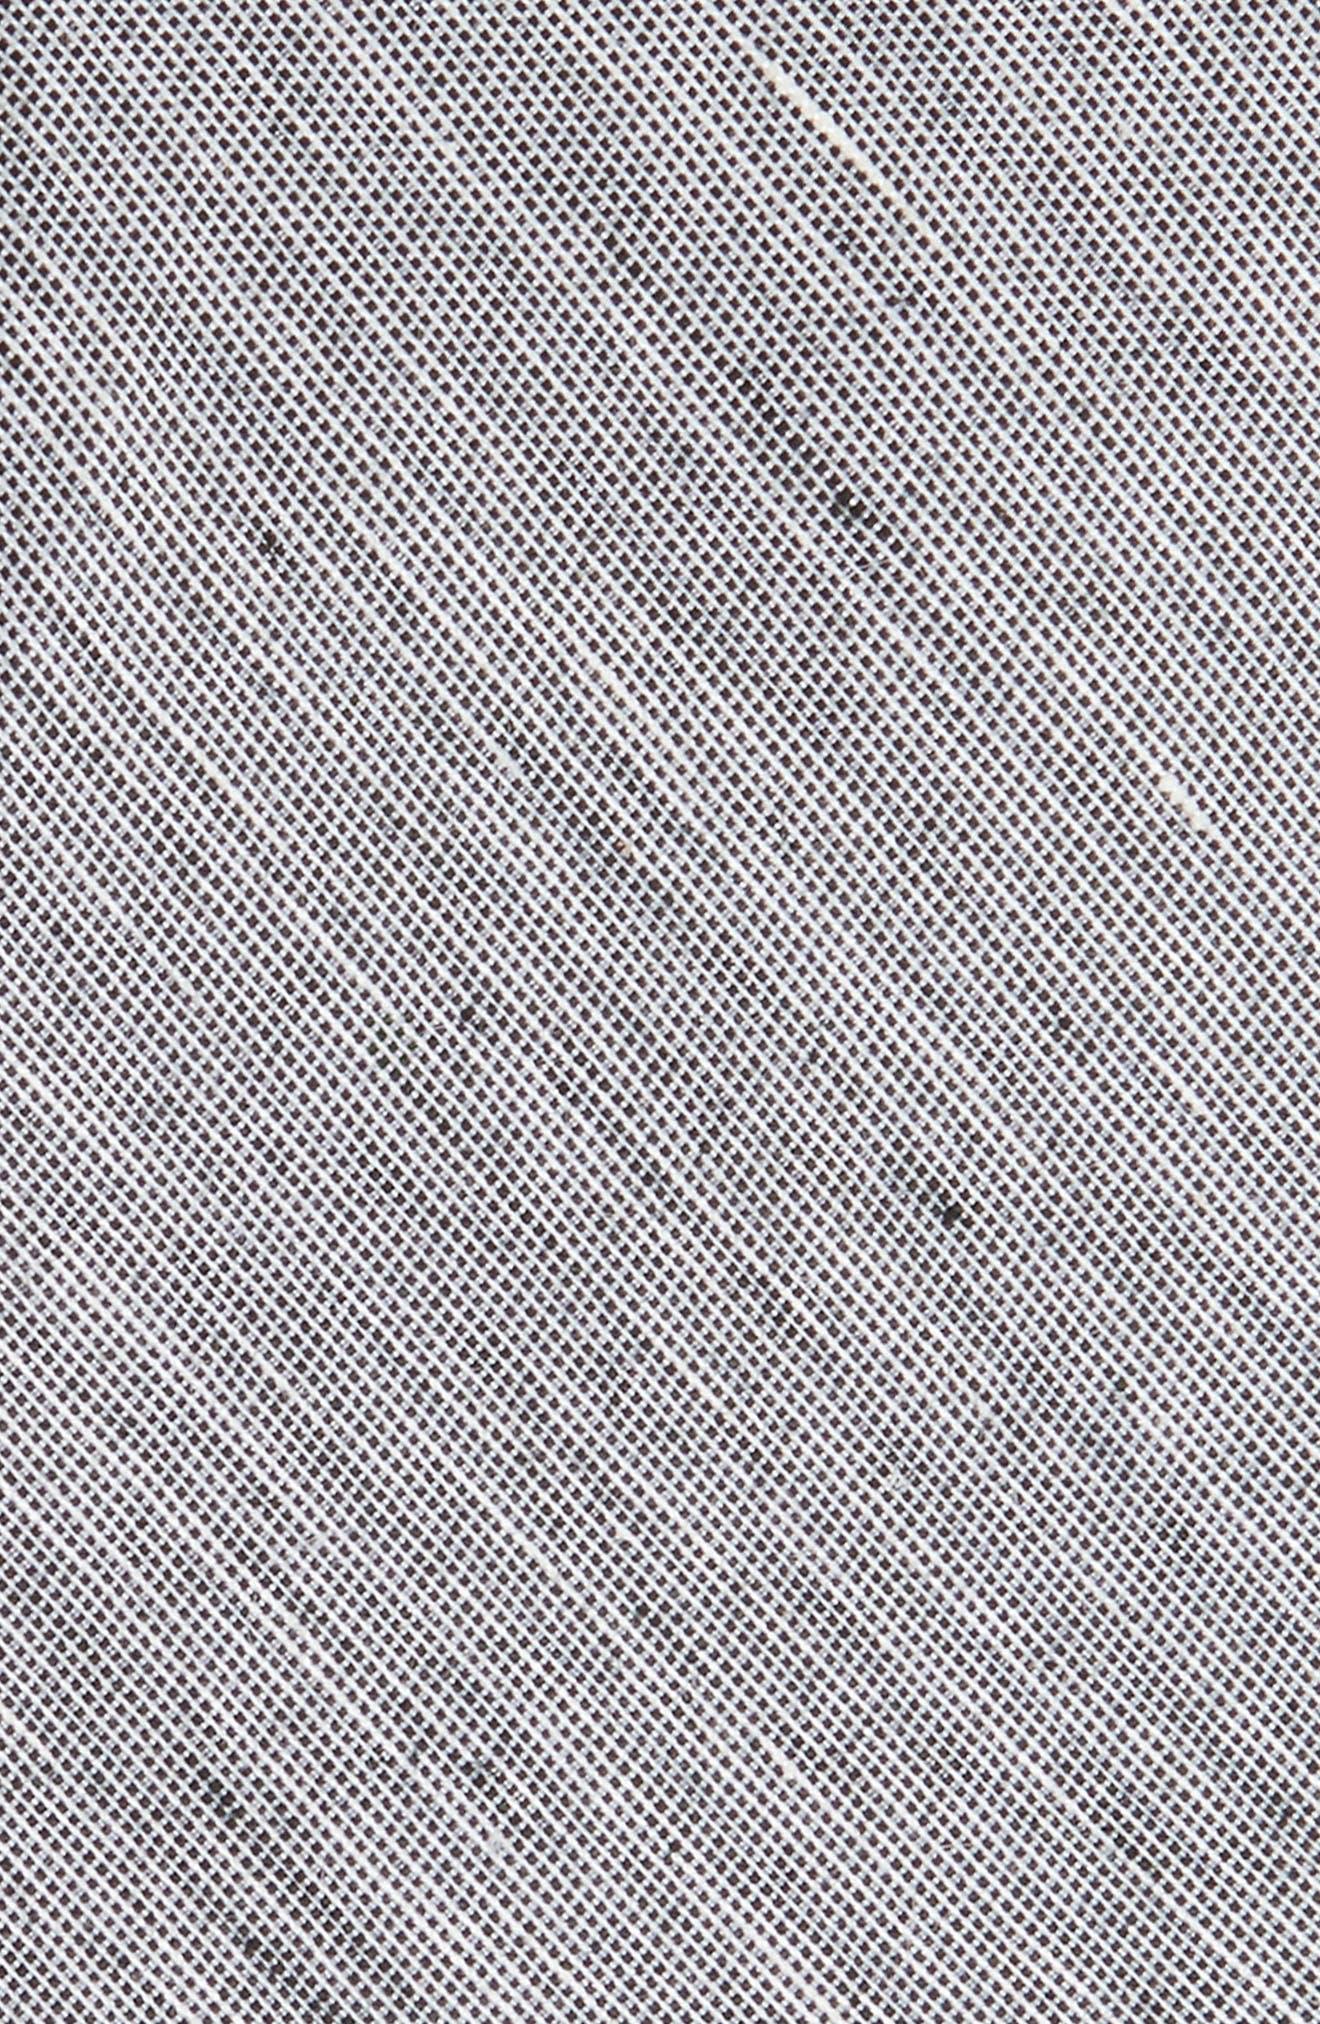 Adena Solid Silk Blend Skinny Tie,                             Alternate thumbnail 2, color,                             001